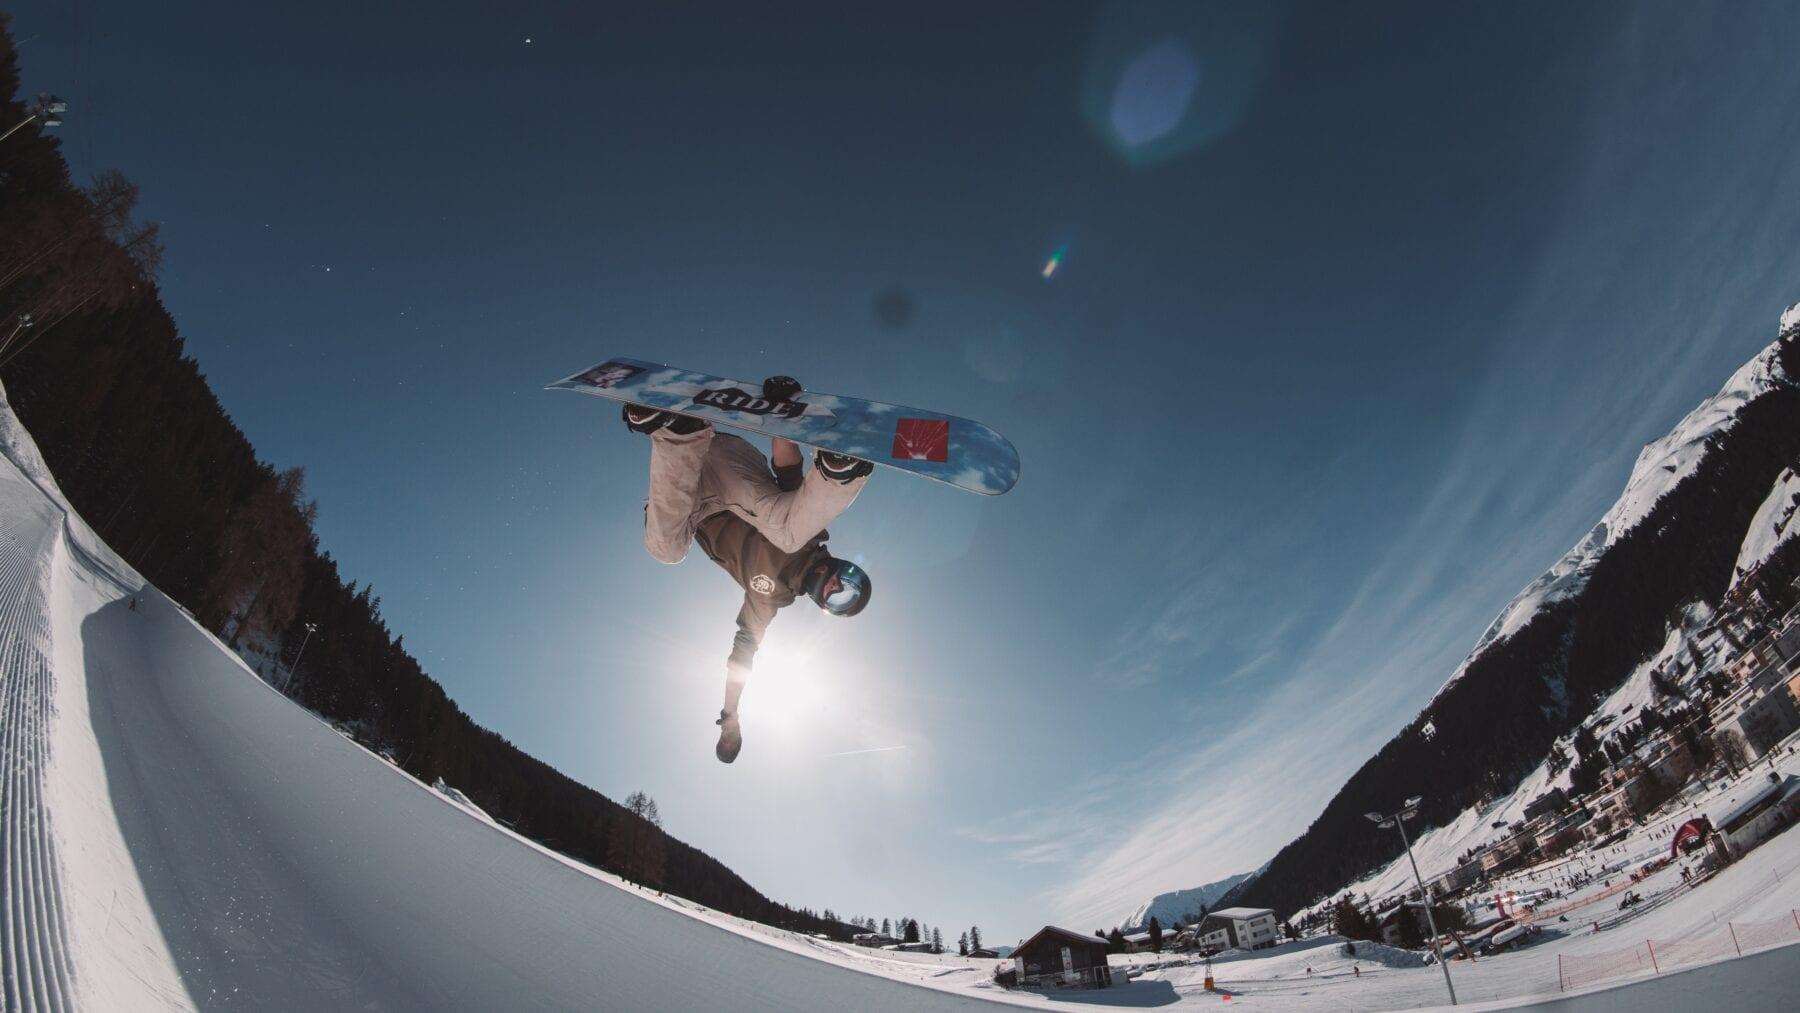 FIS Snowboard Wereldkampioenschap Snowboard tricks